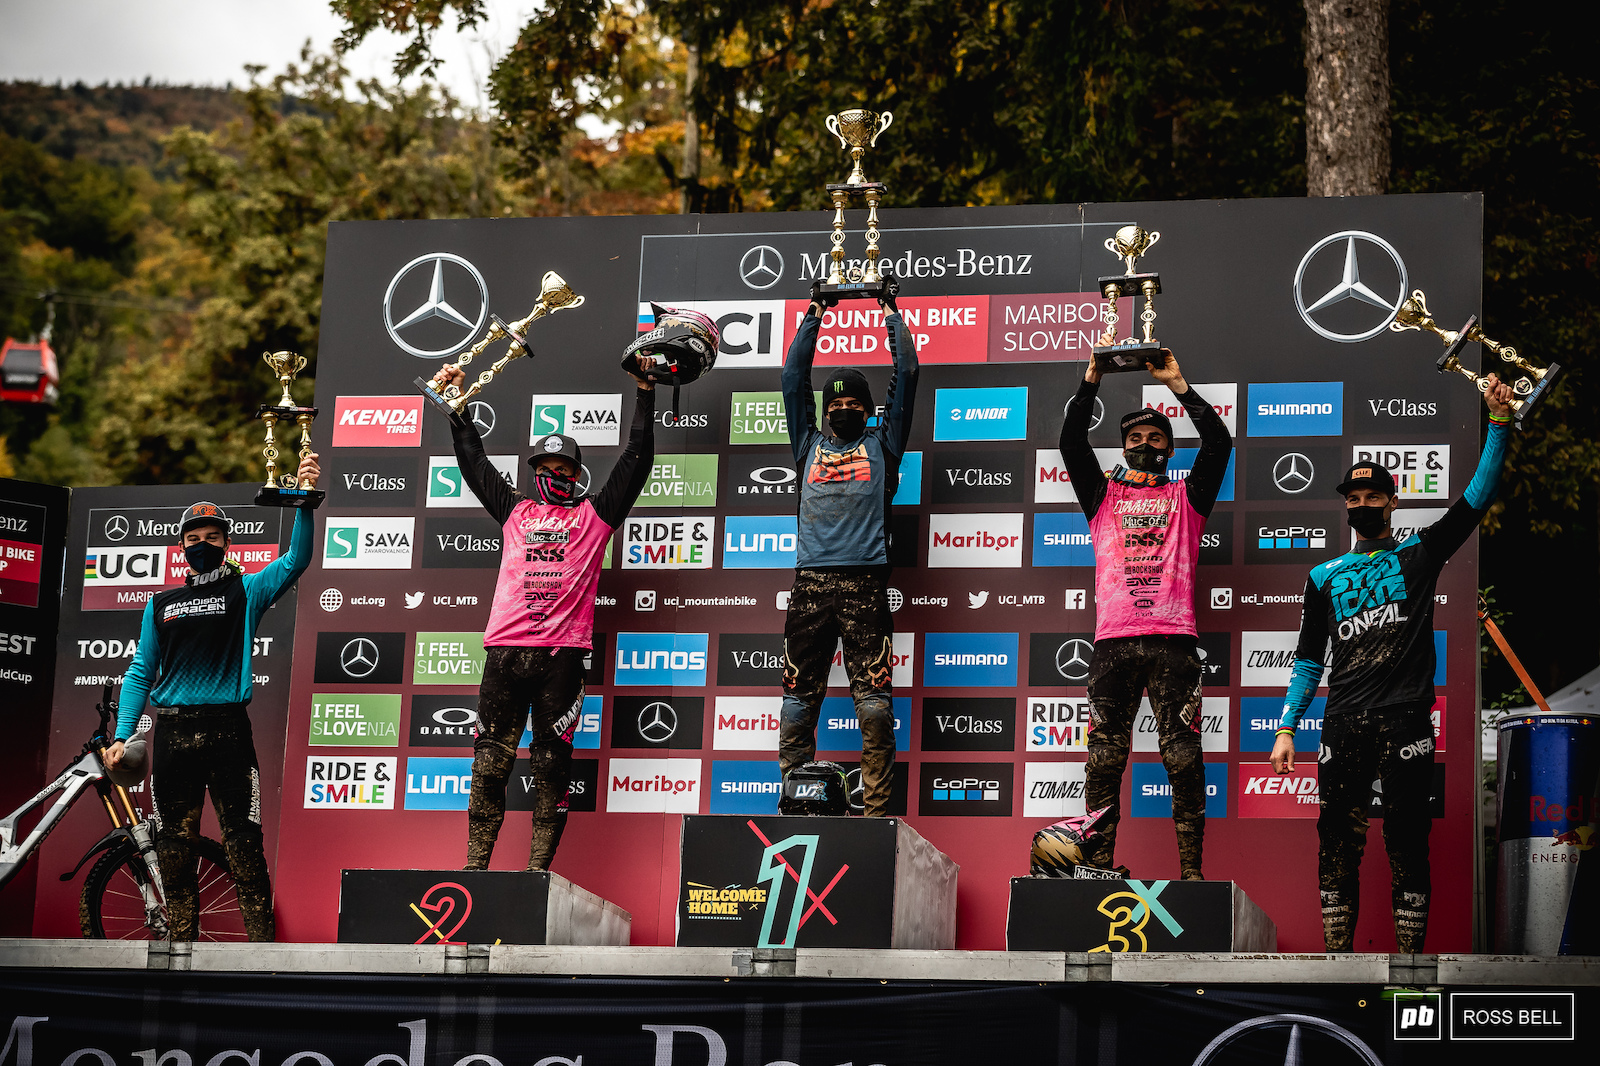 Yout top 5 elite men 1st Loris Vergier 2nd Remi Thirion 3rd Thibaut Daprela 4th Matt Walker 5th Greg Minnaar